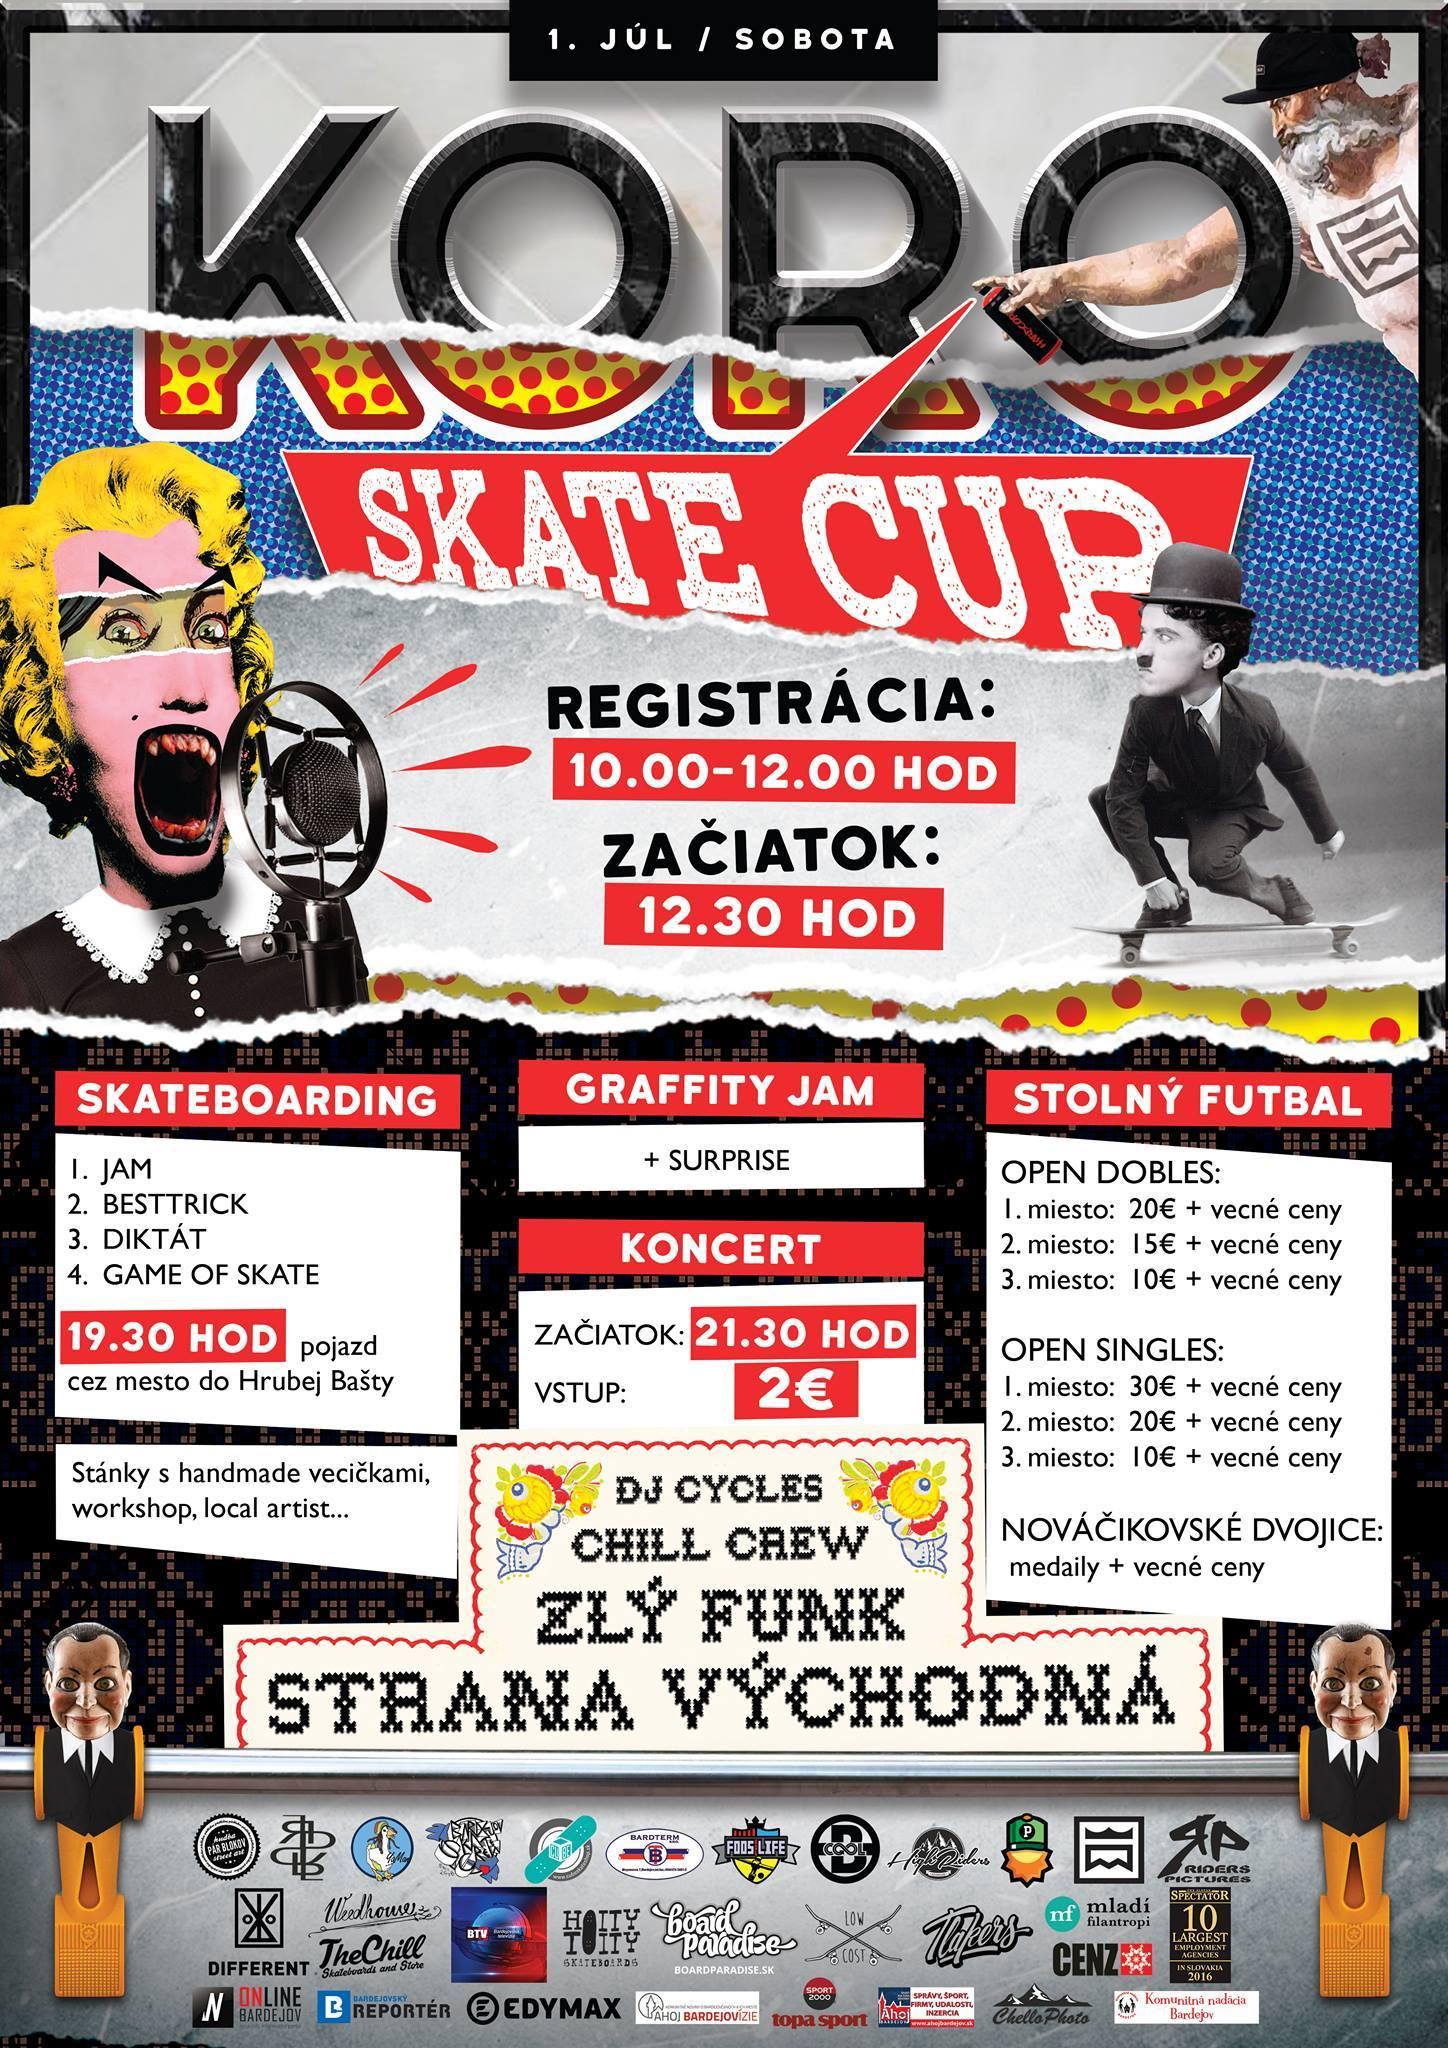 KORO Skate Cup